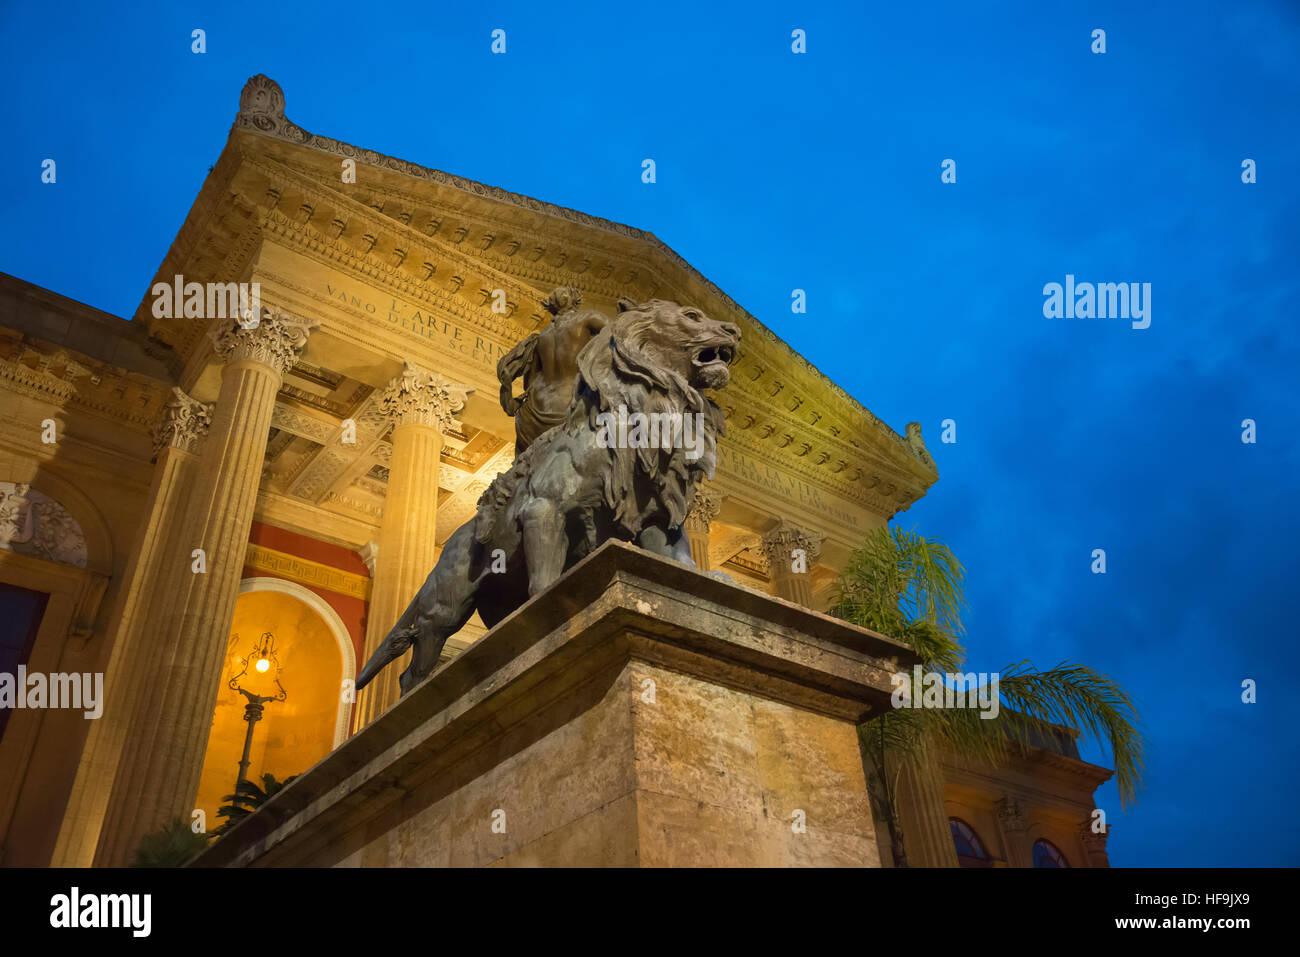 Teatro Massimo, Palermo, Sicily, Italy, Europe - Stock Image